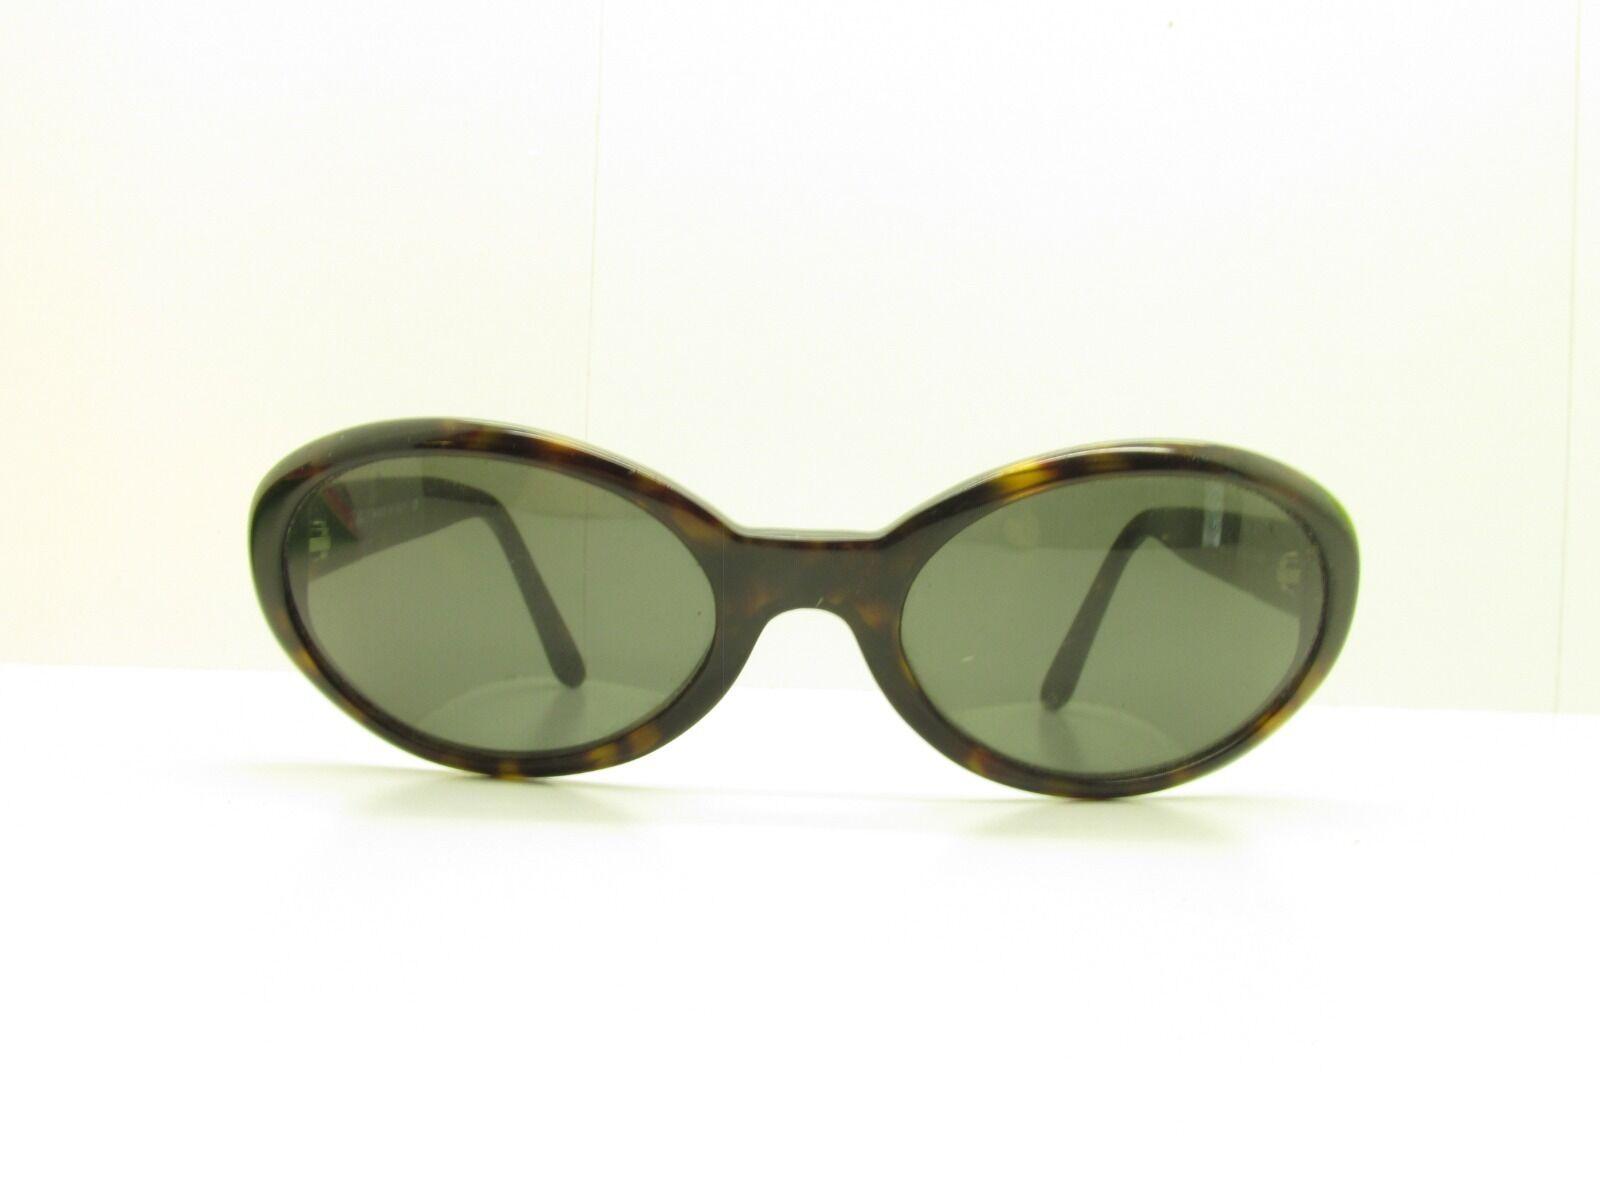 RAY-BAN RB 2110 RITUALS 902/6 SPORT Eyeglasses EYEWEAR FRAMES ...